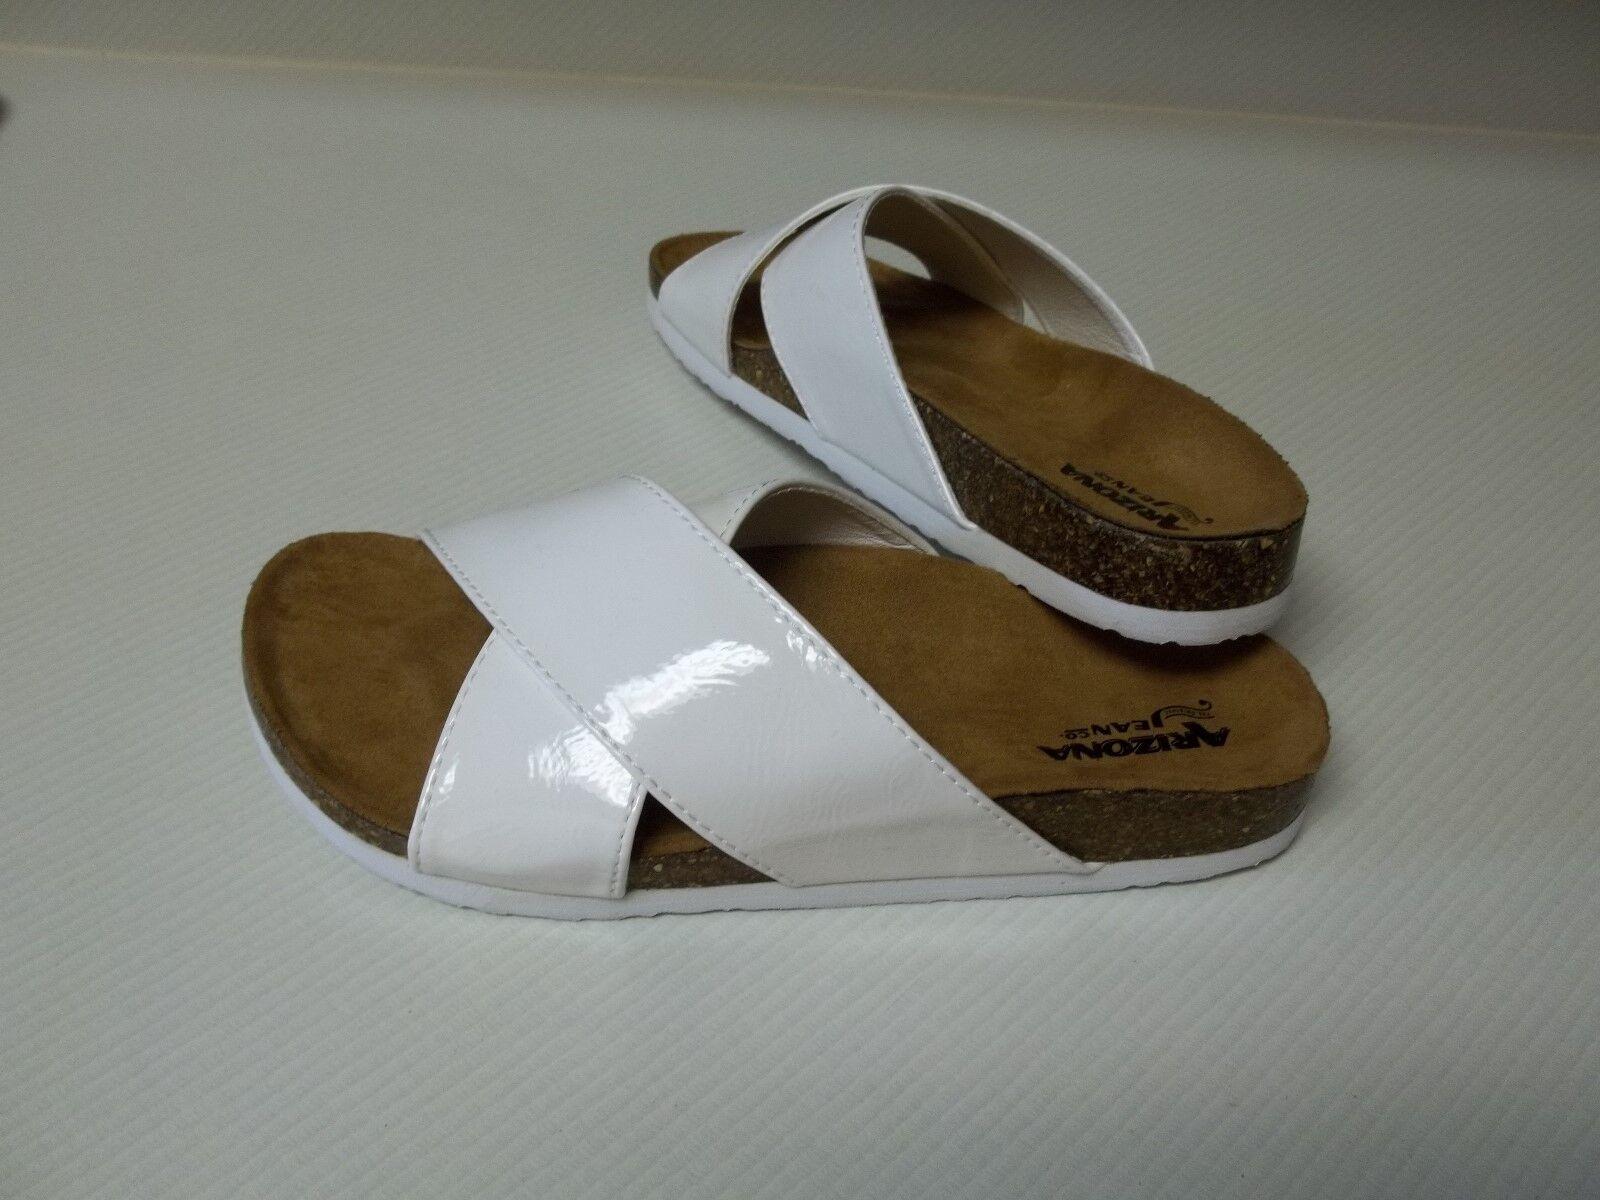 Women's Arizona New Sandals Paxton White 6M New Arizona W/O Box $40 b2b11c